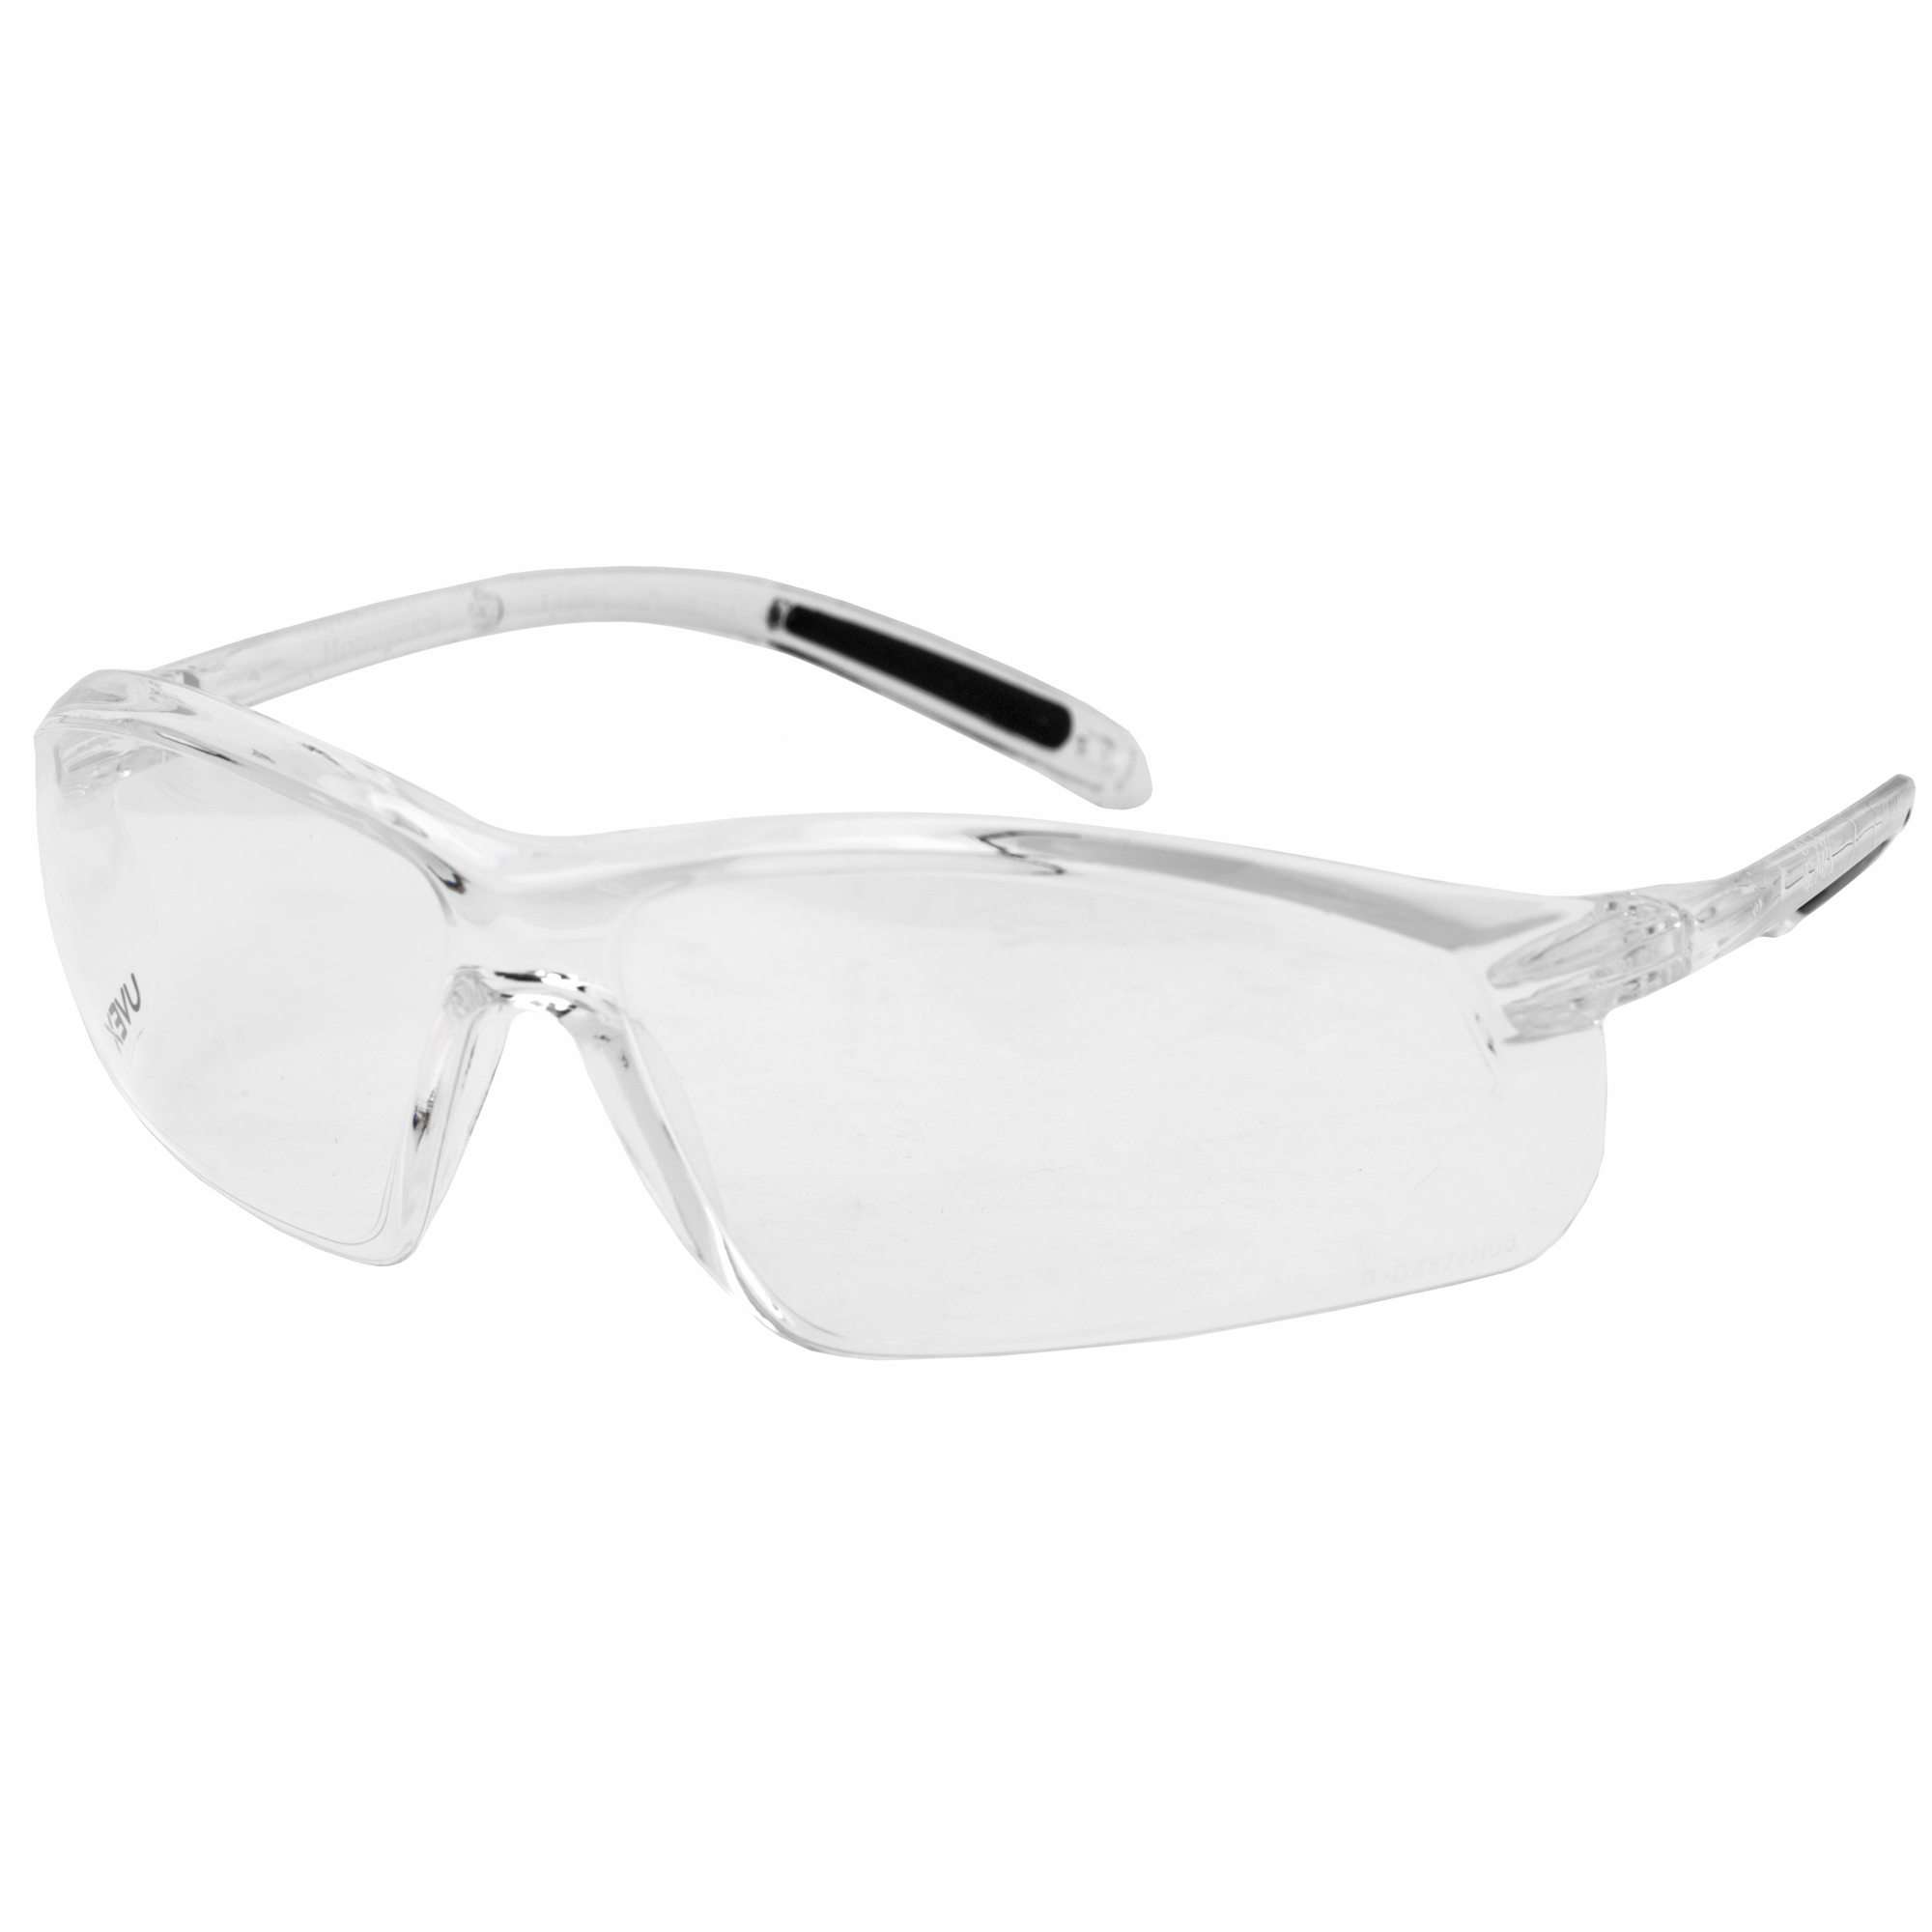 H/l A700 Slim Clear Lens 10pk